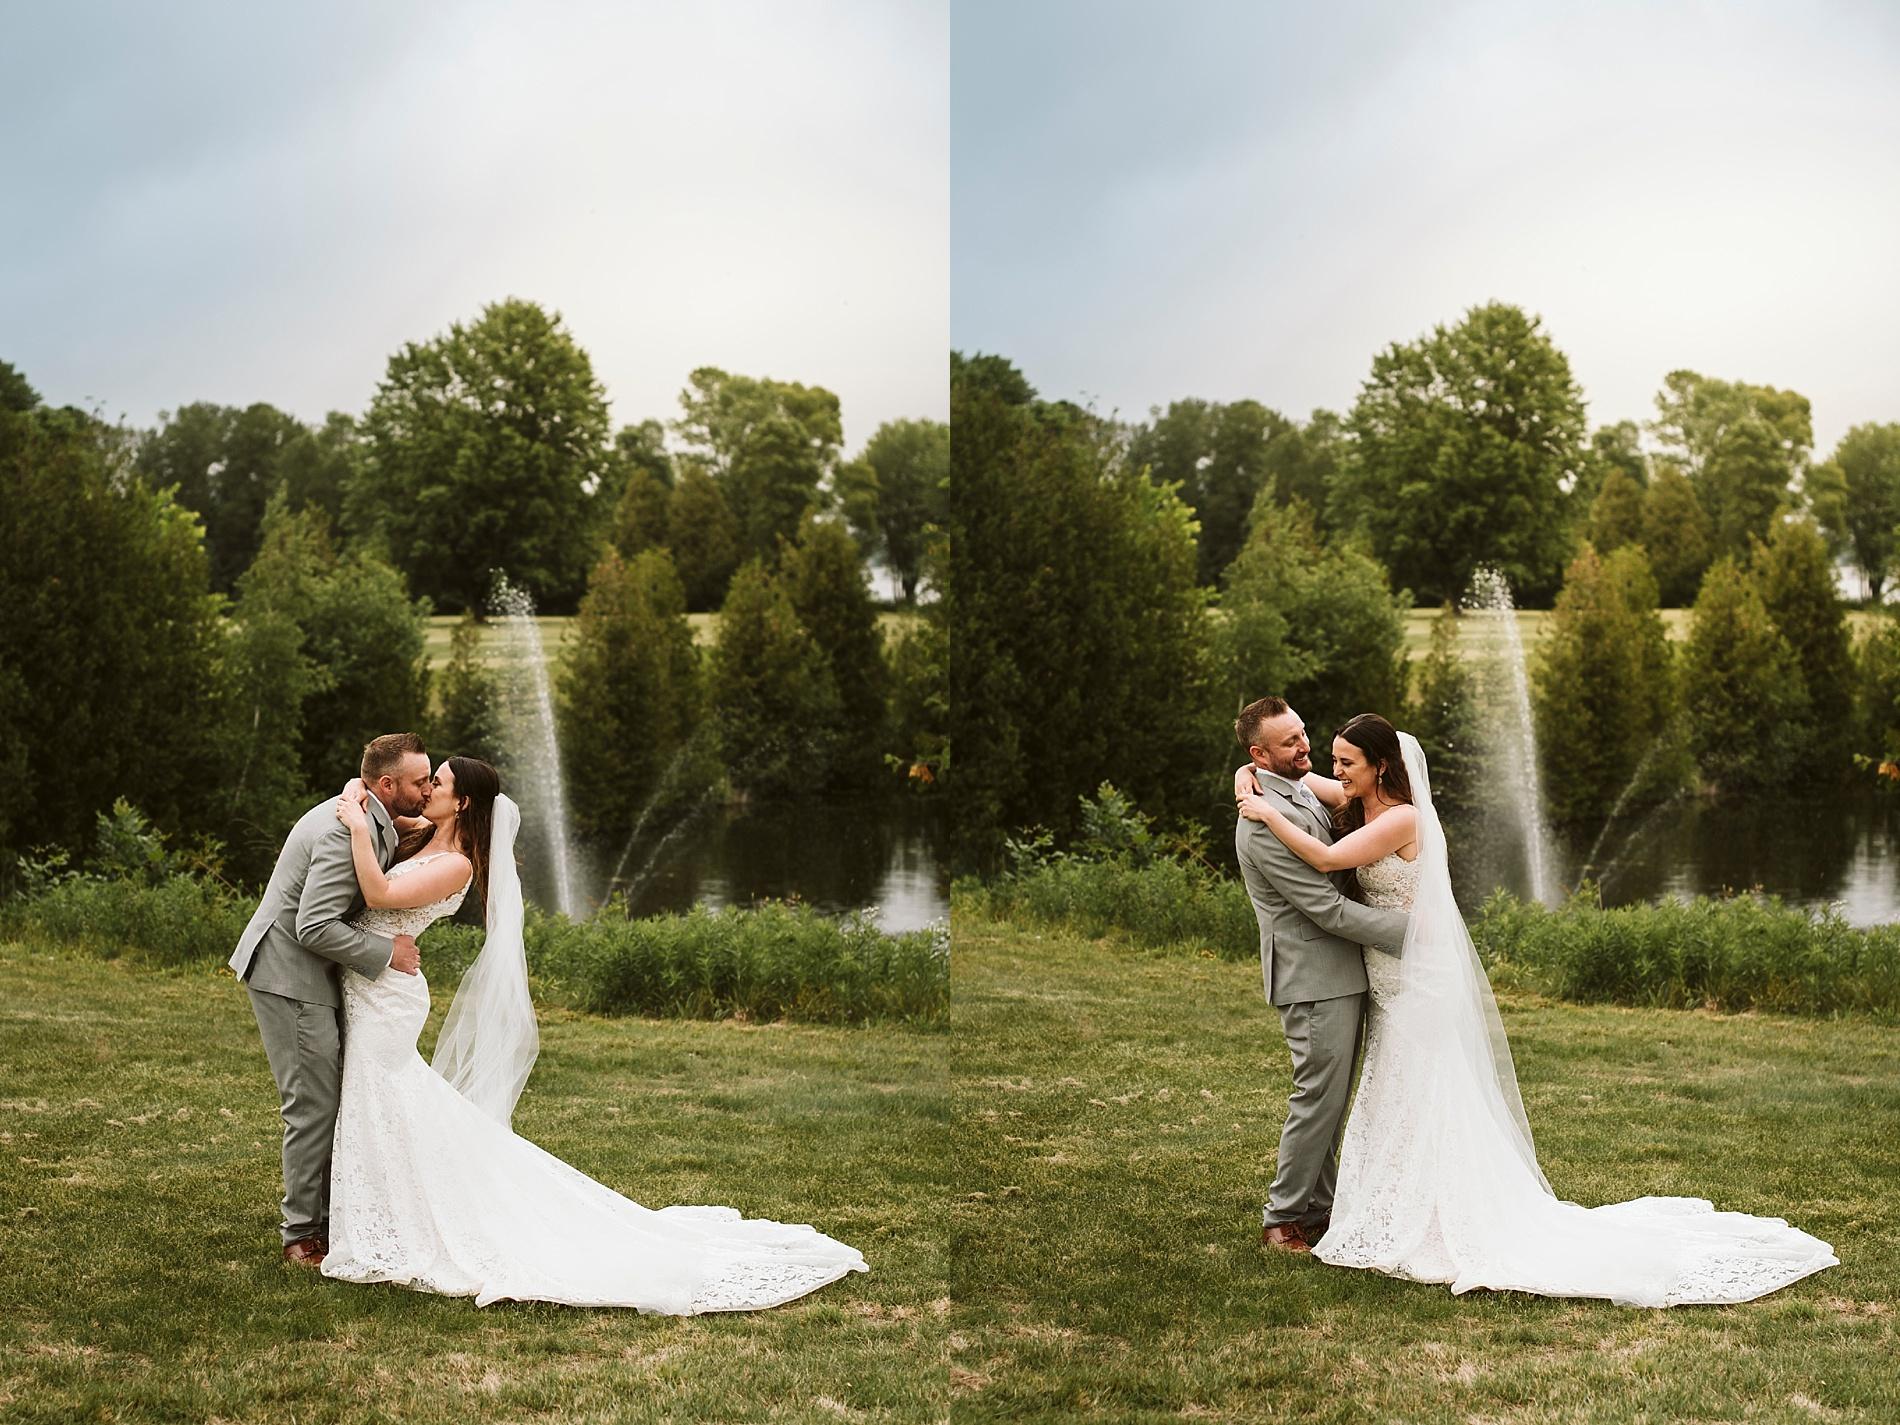 Kawartha_Lakes_Wedding_Bobcageon_Eganridge_Resort_Toronto_Photographer_0052.jpg